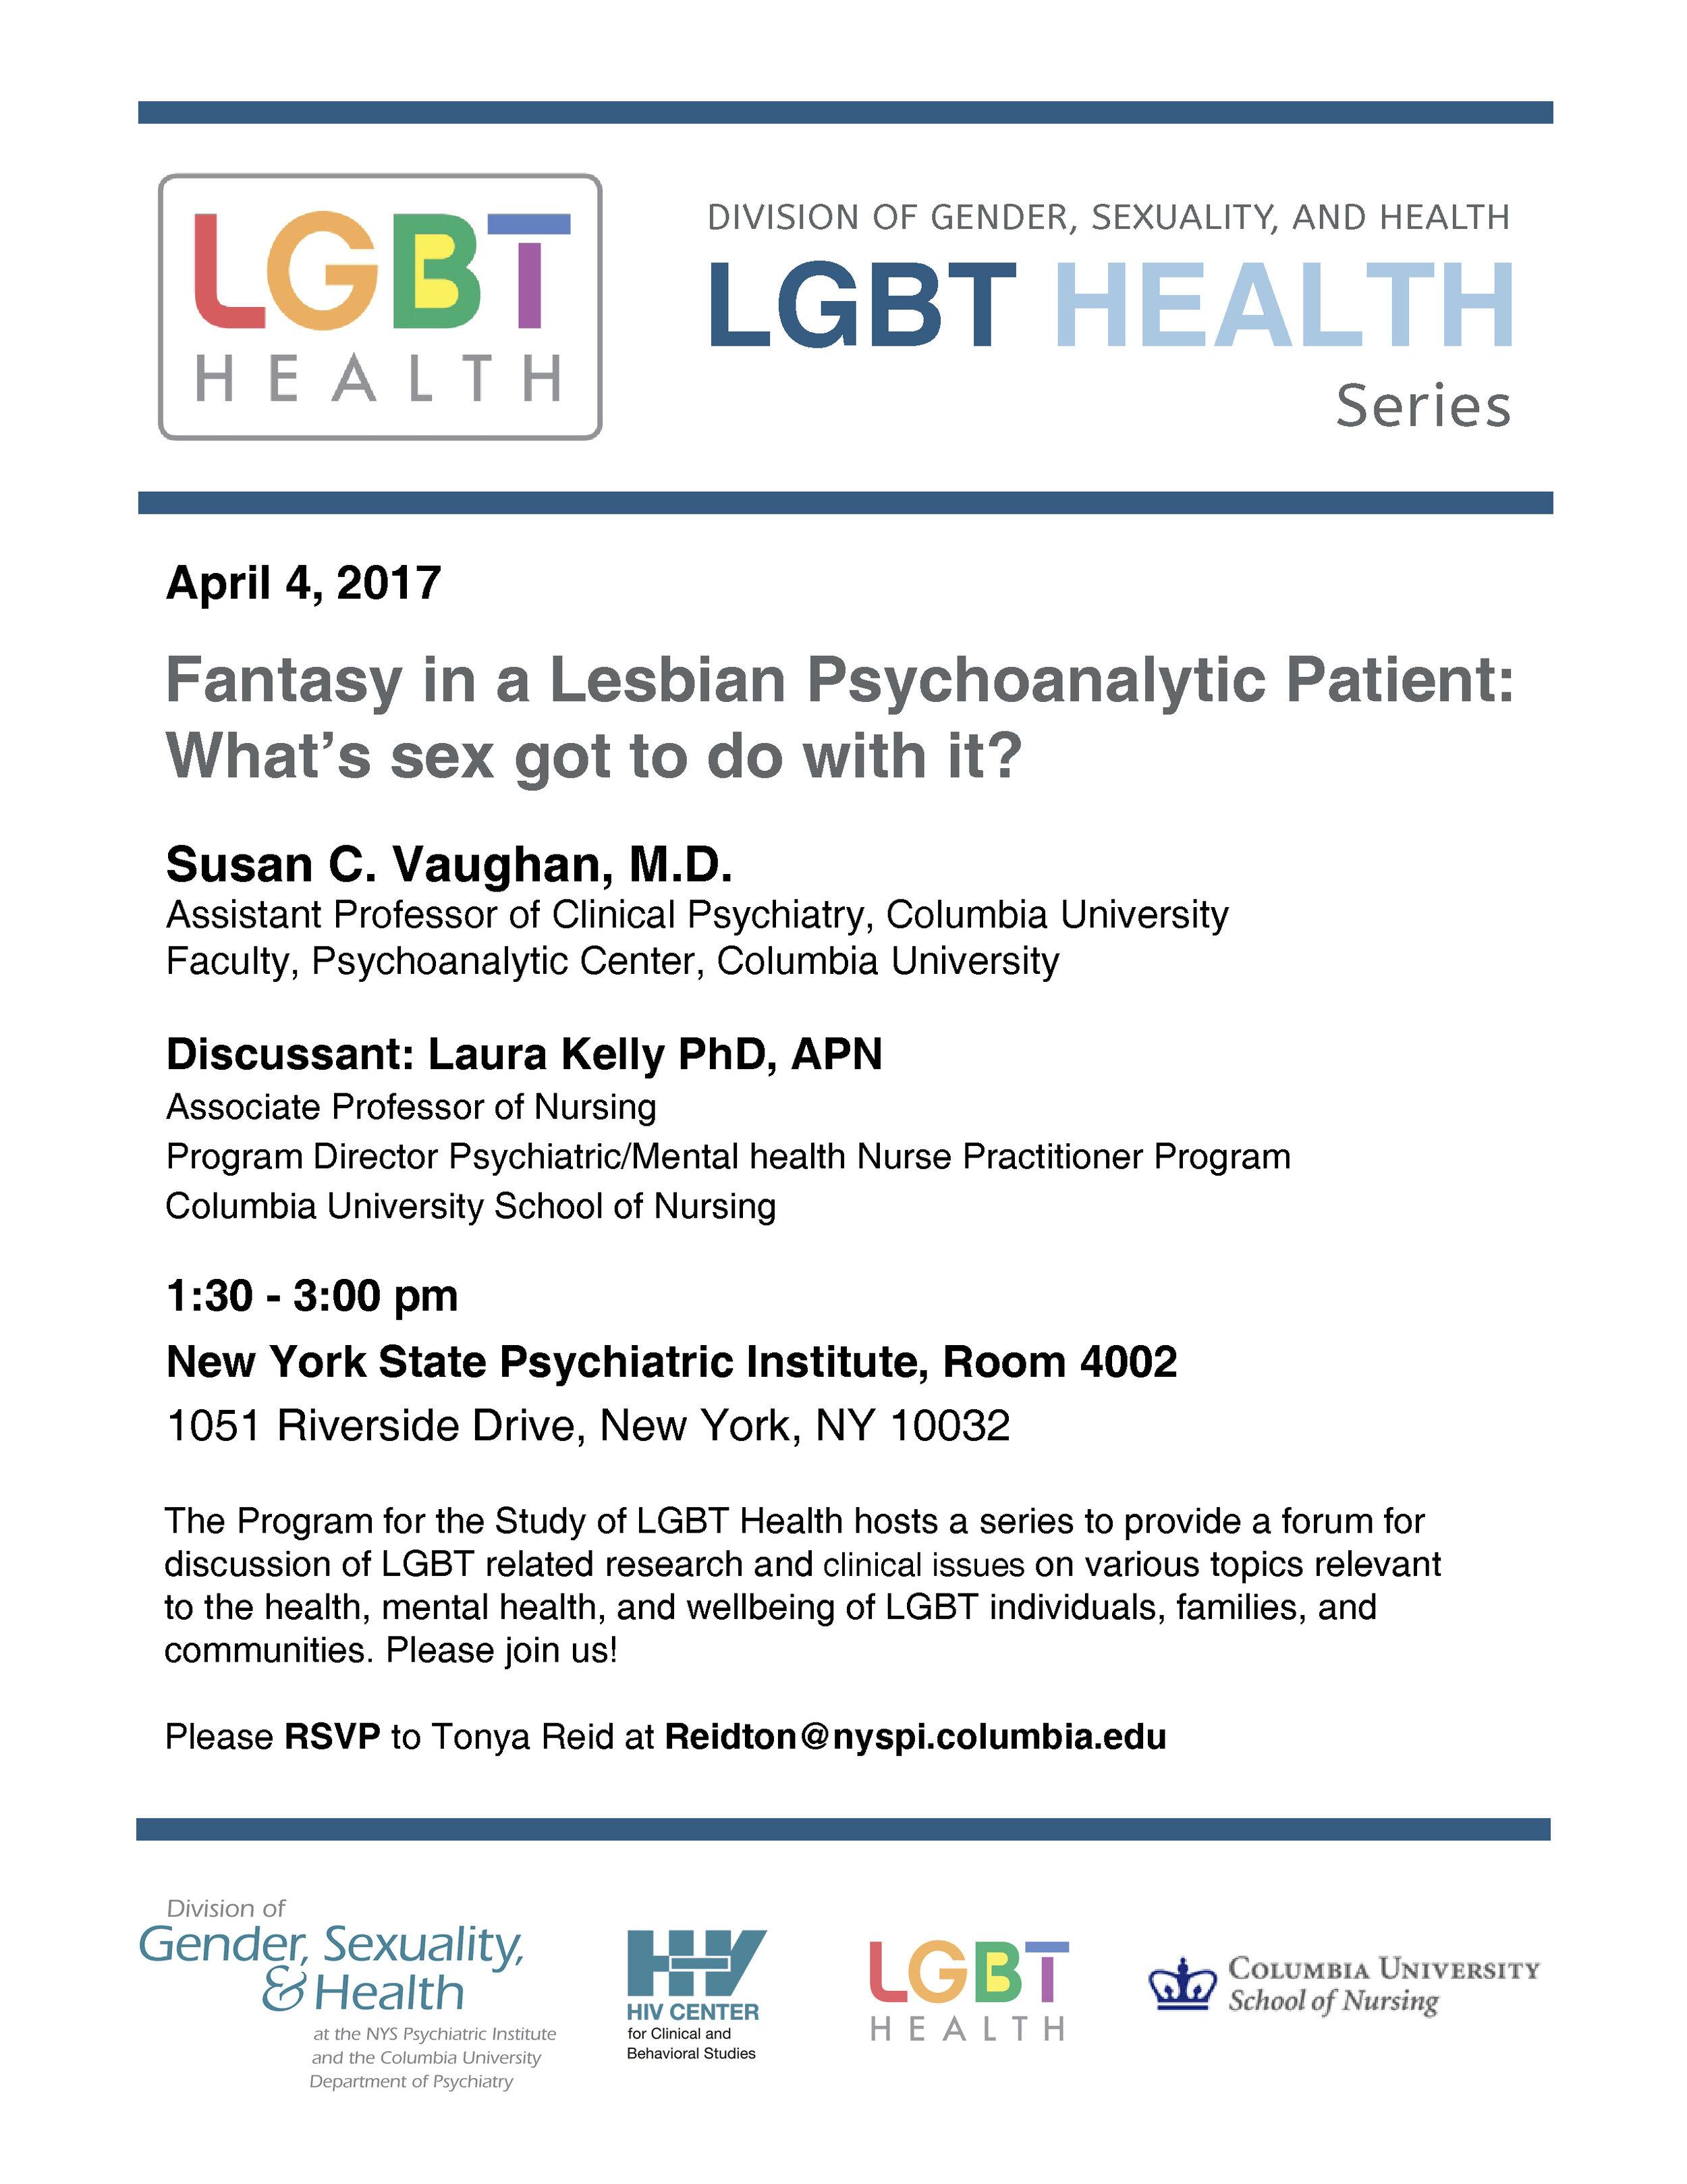 LGBT Health Series April 4 2017.jpg